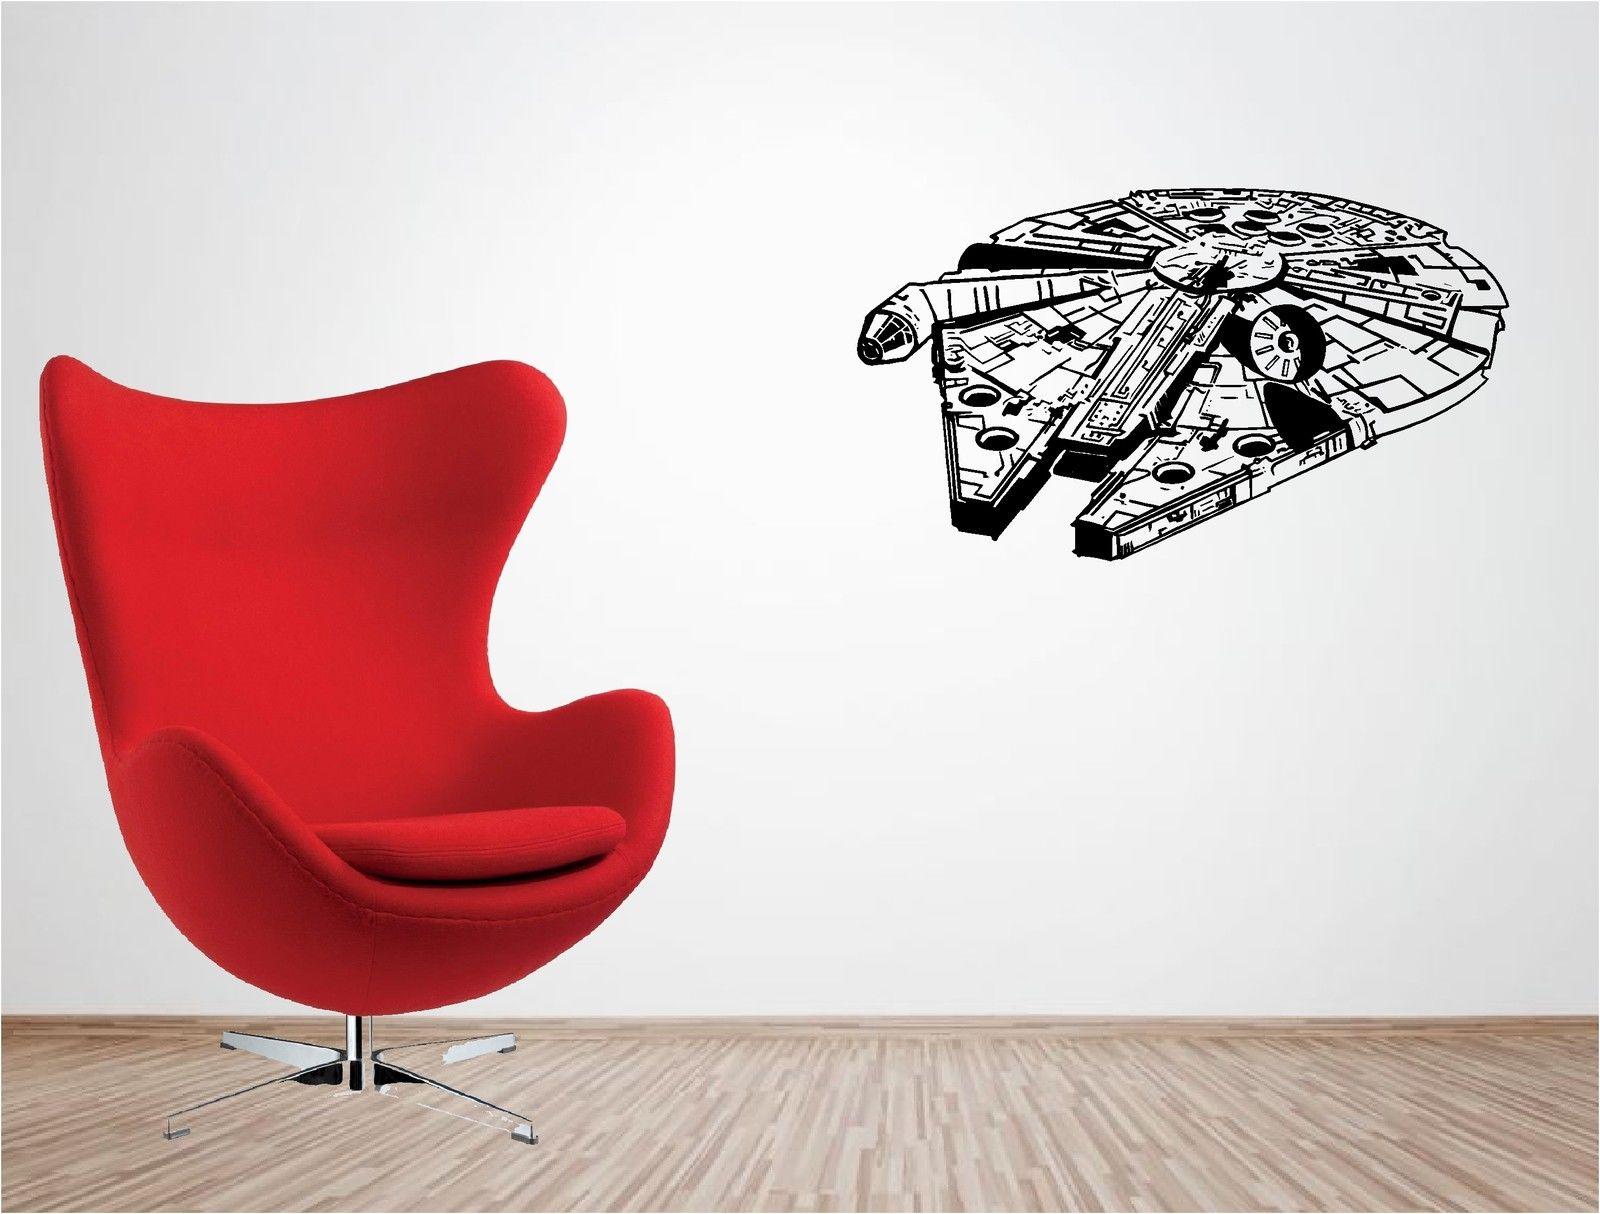 G090 Starwars Millenium Falcon Vinyl Wall Art Stickers Art